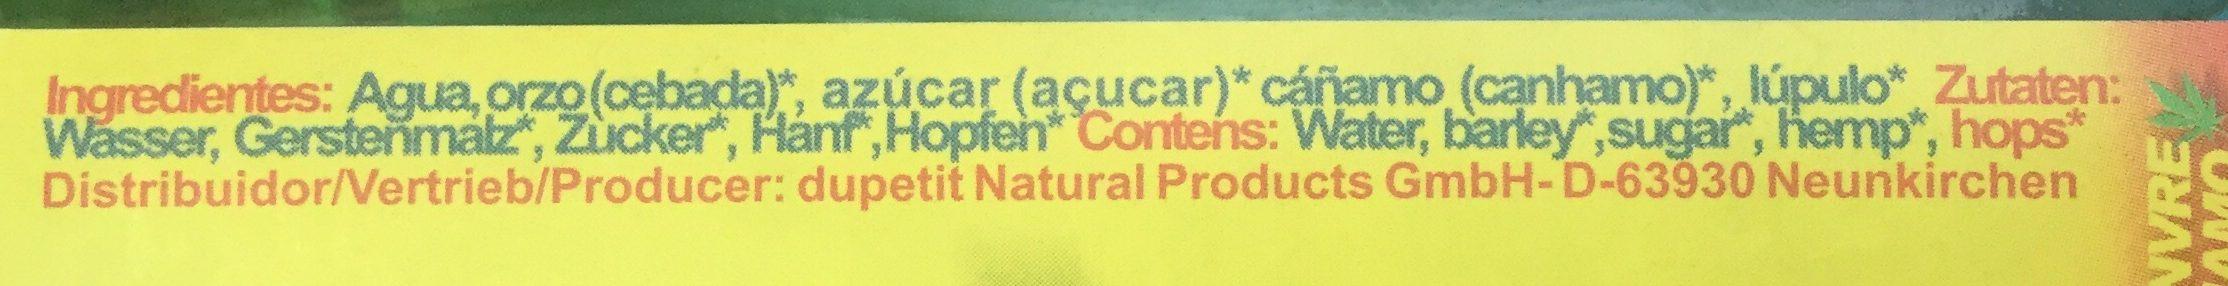 Der Hanftrunk - Ingredients - en